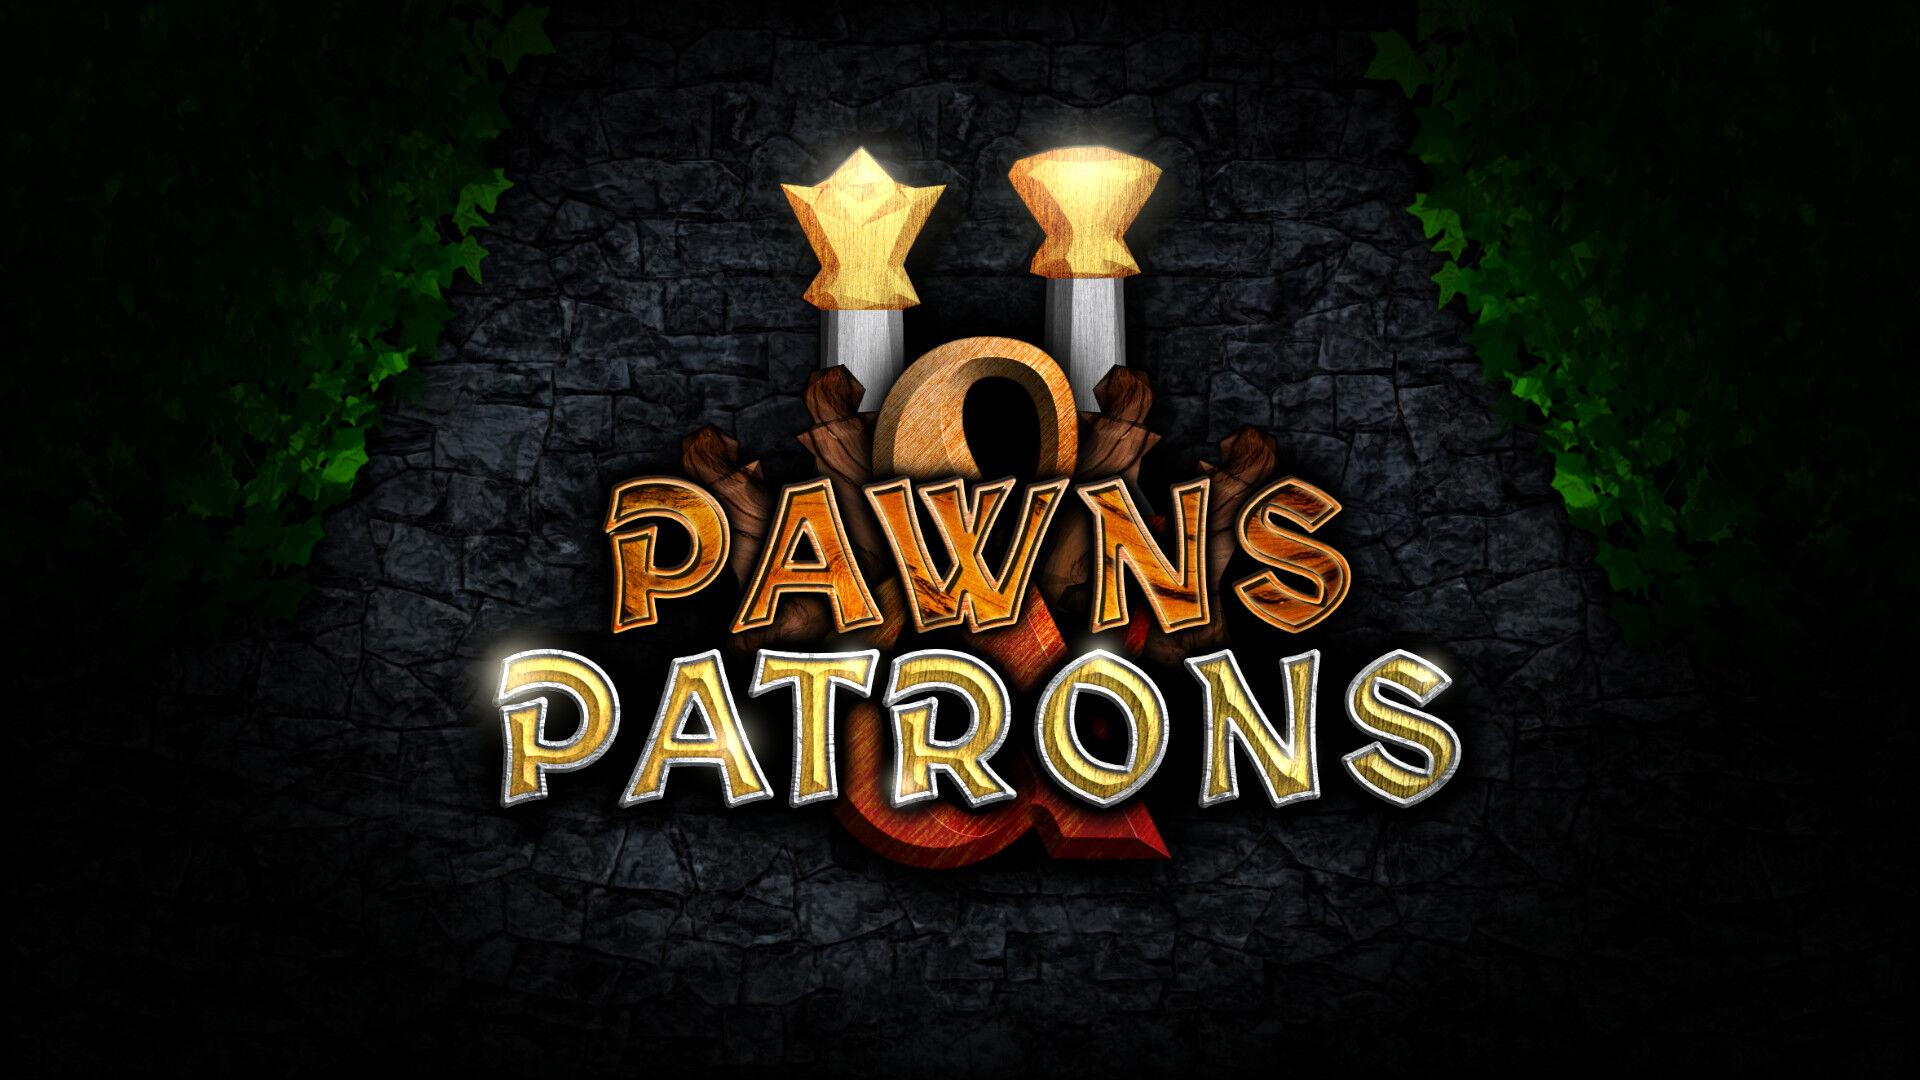 Pawns and Patrons logo.jpg